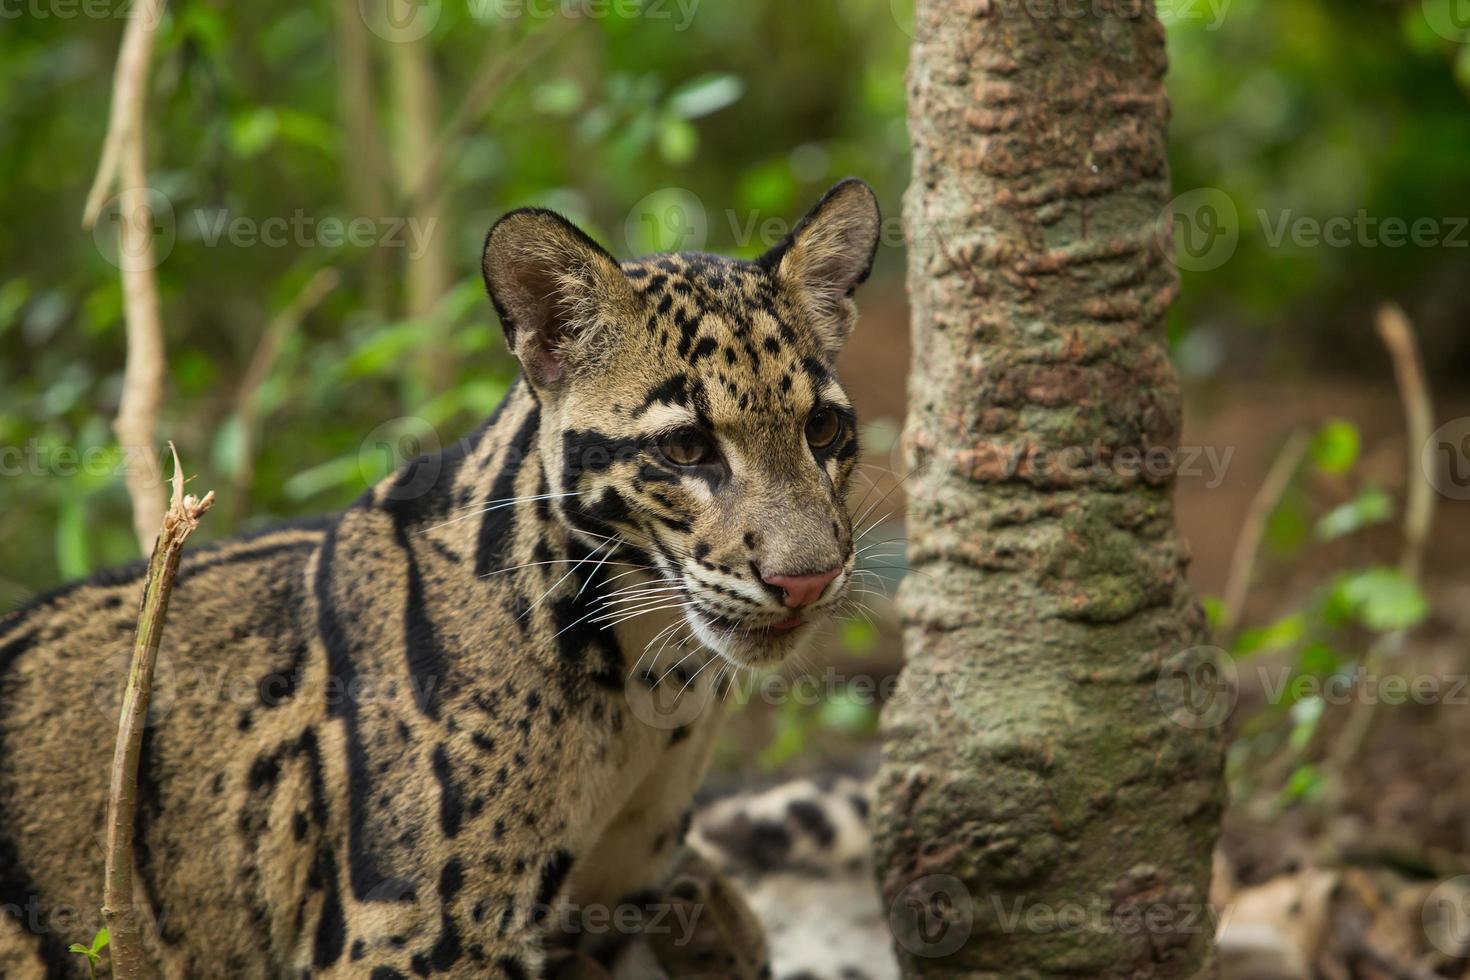 léopard opacifié (neofelis nebulosa) photo